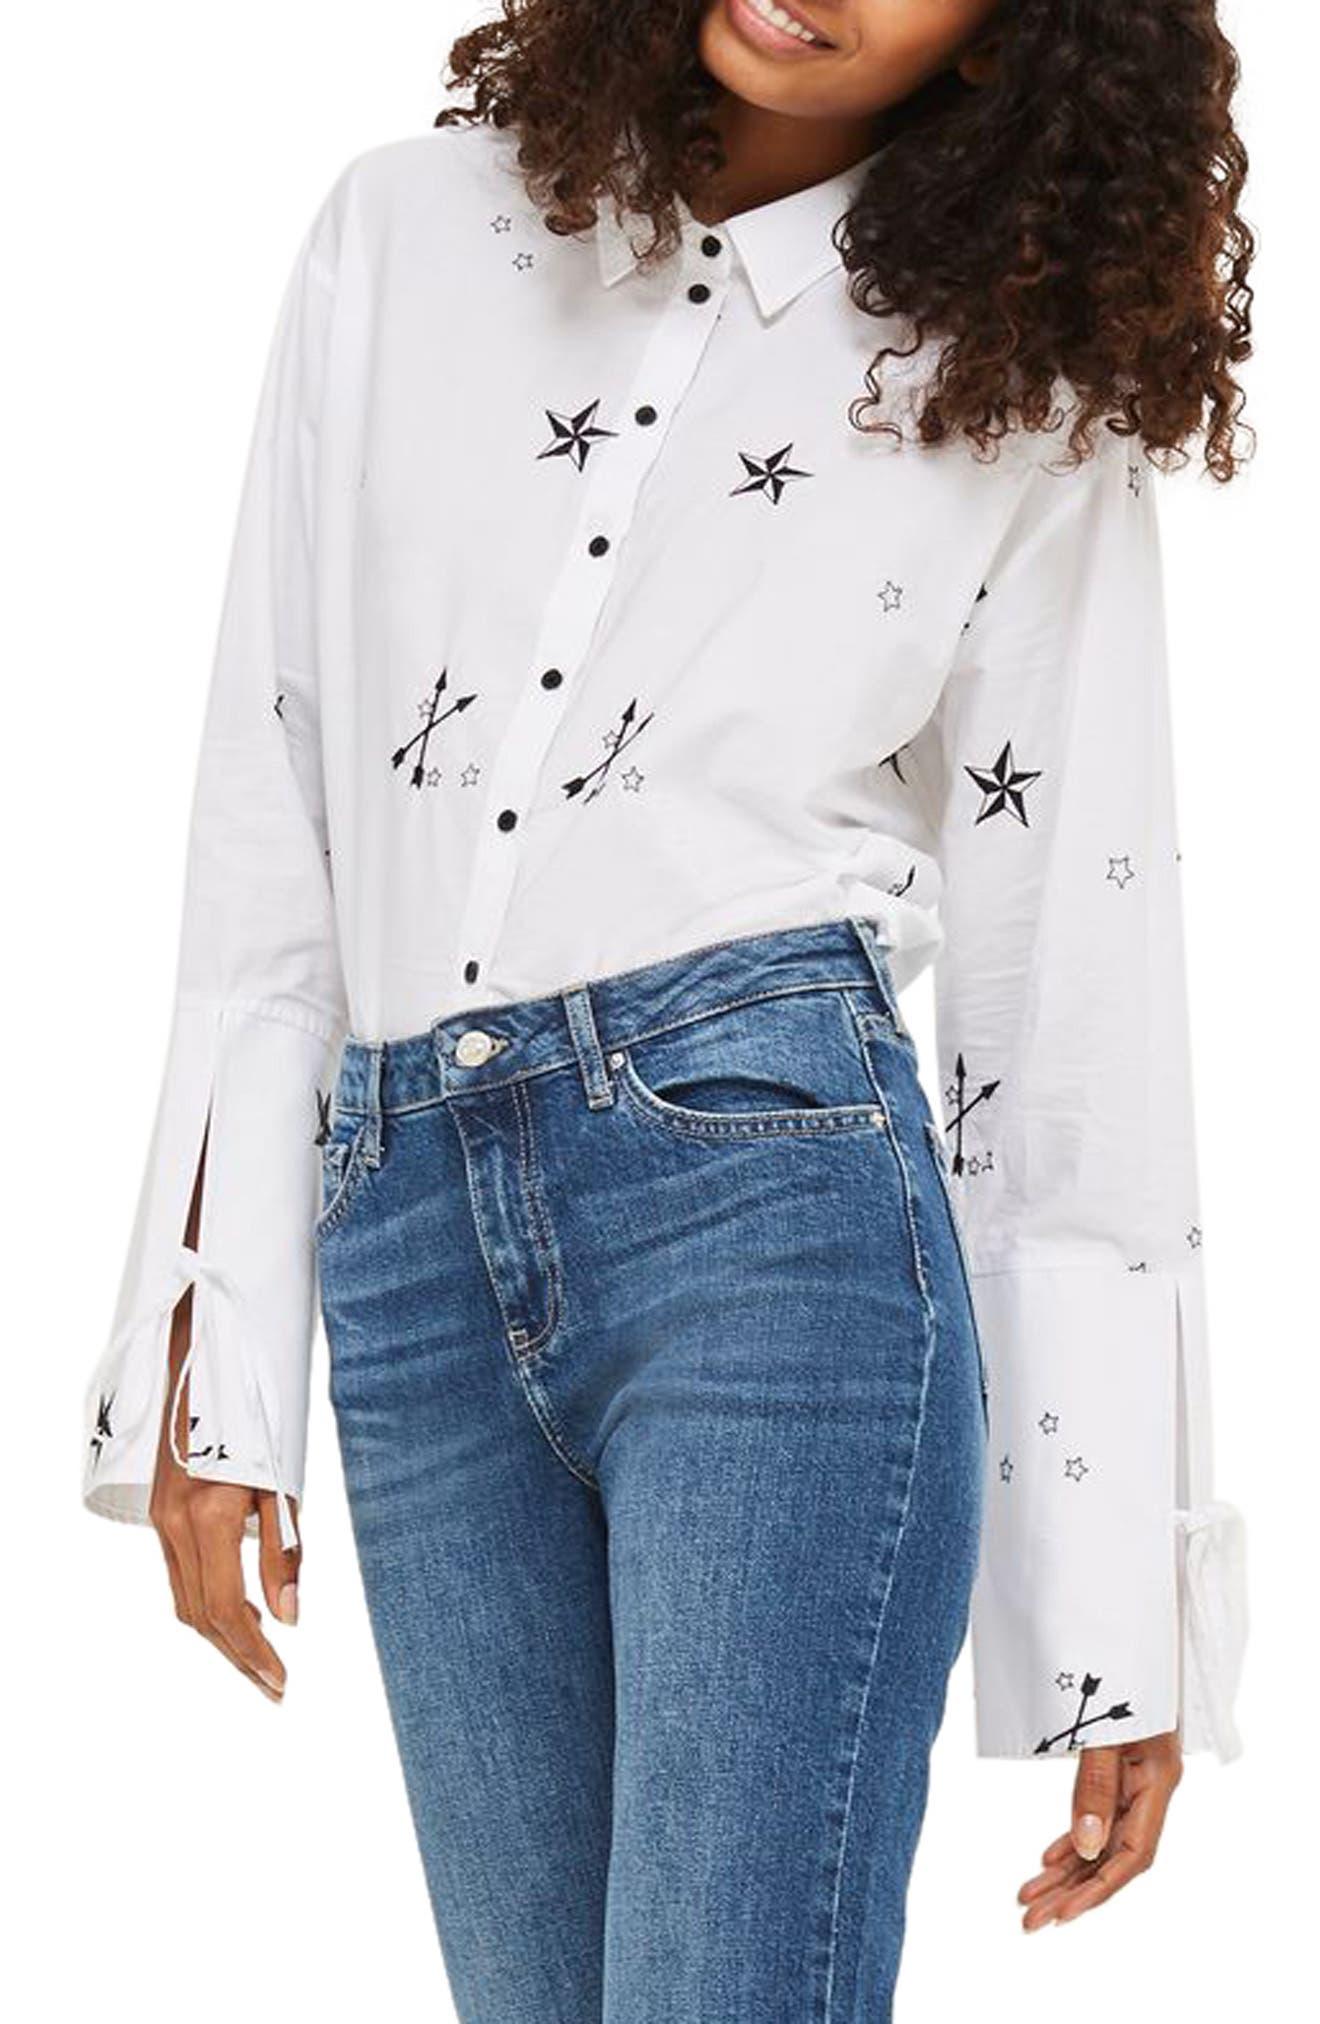 Star Embroidered Shirt,                             Main thumbnail 1, color,                             100